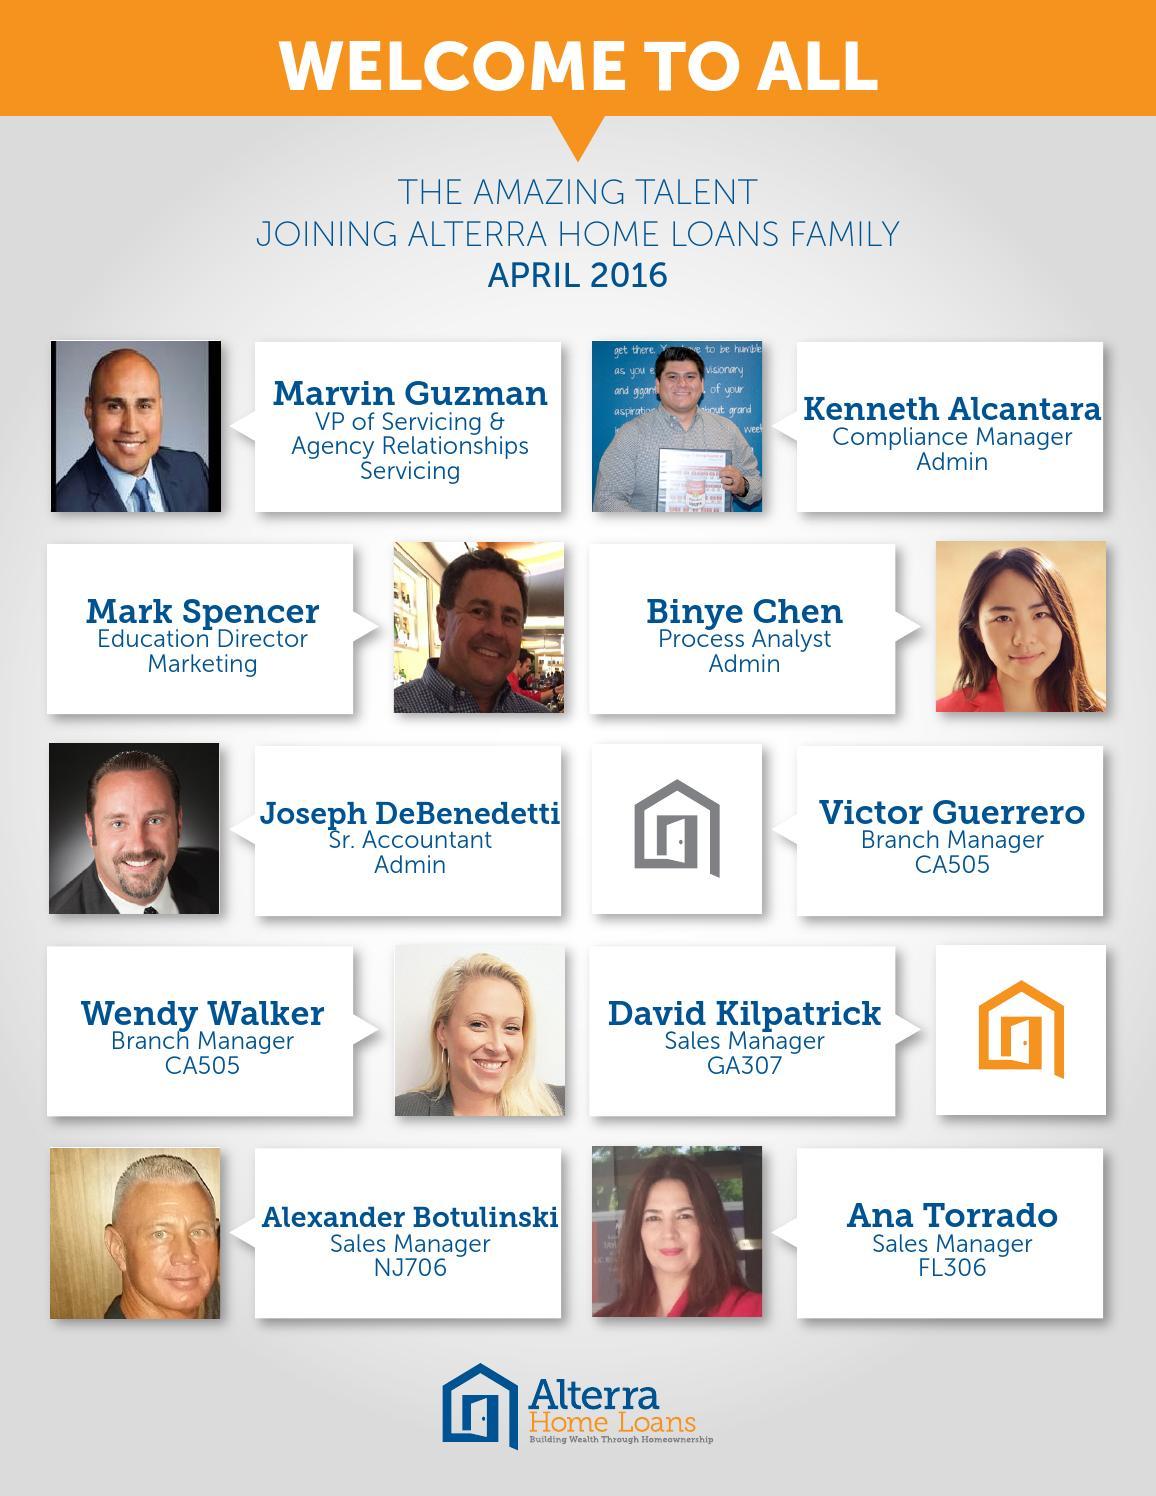 Alterra Home Loans Marketing Director